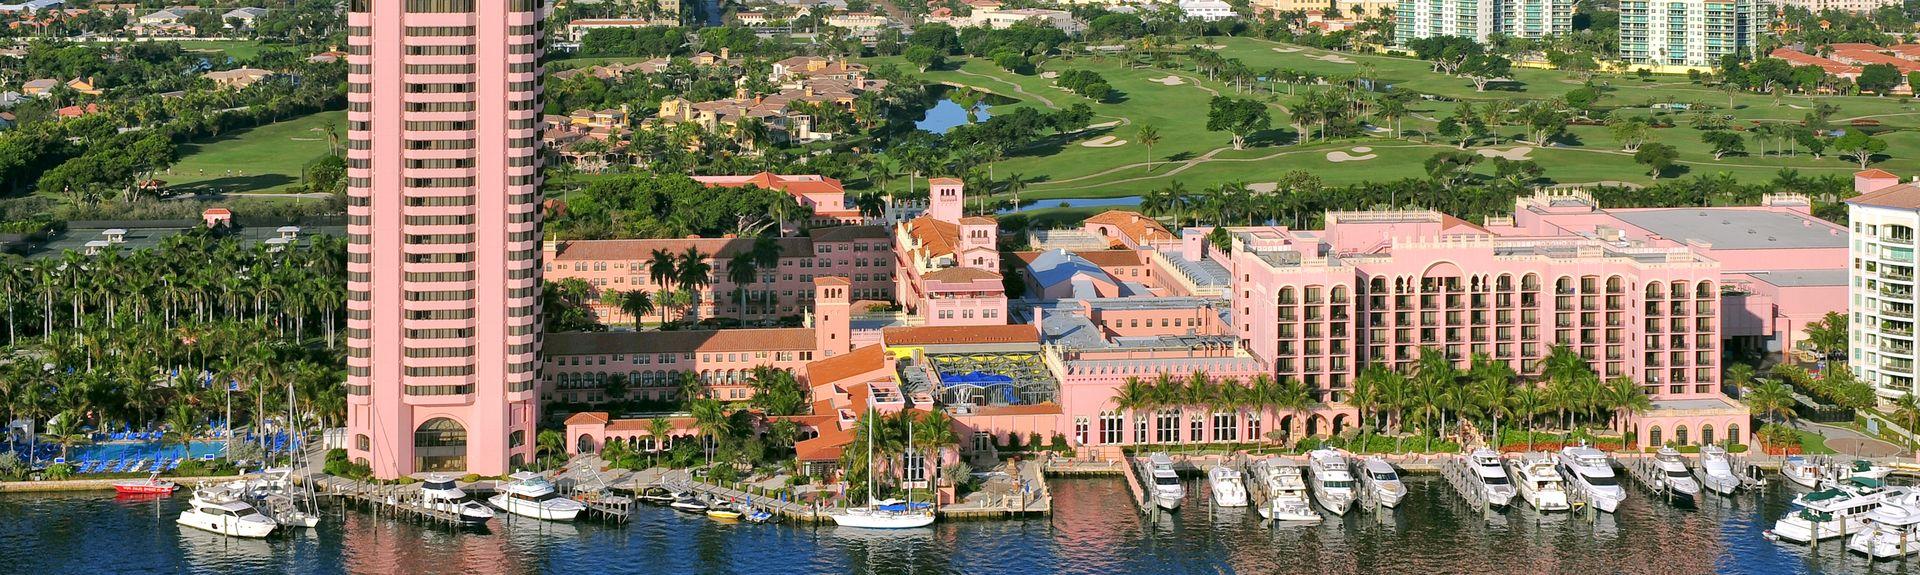 Boca Raton, Florida, Verenigde Staten